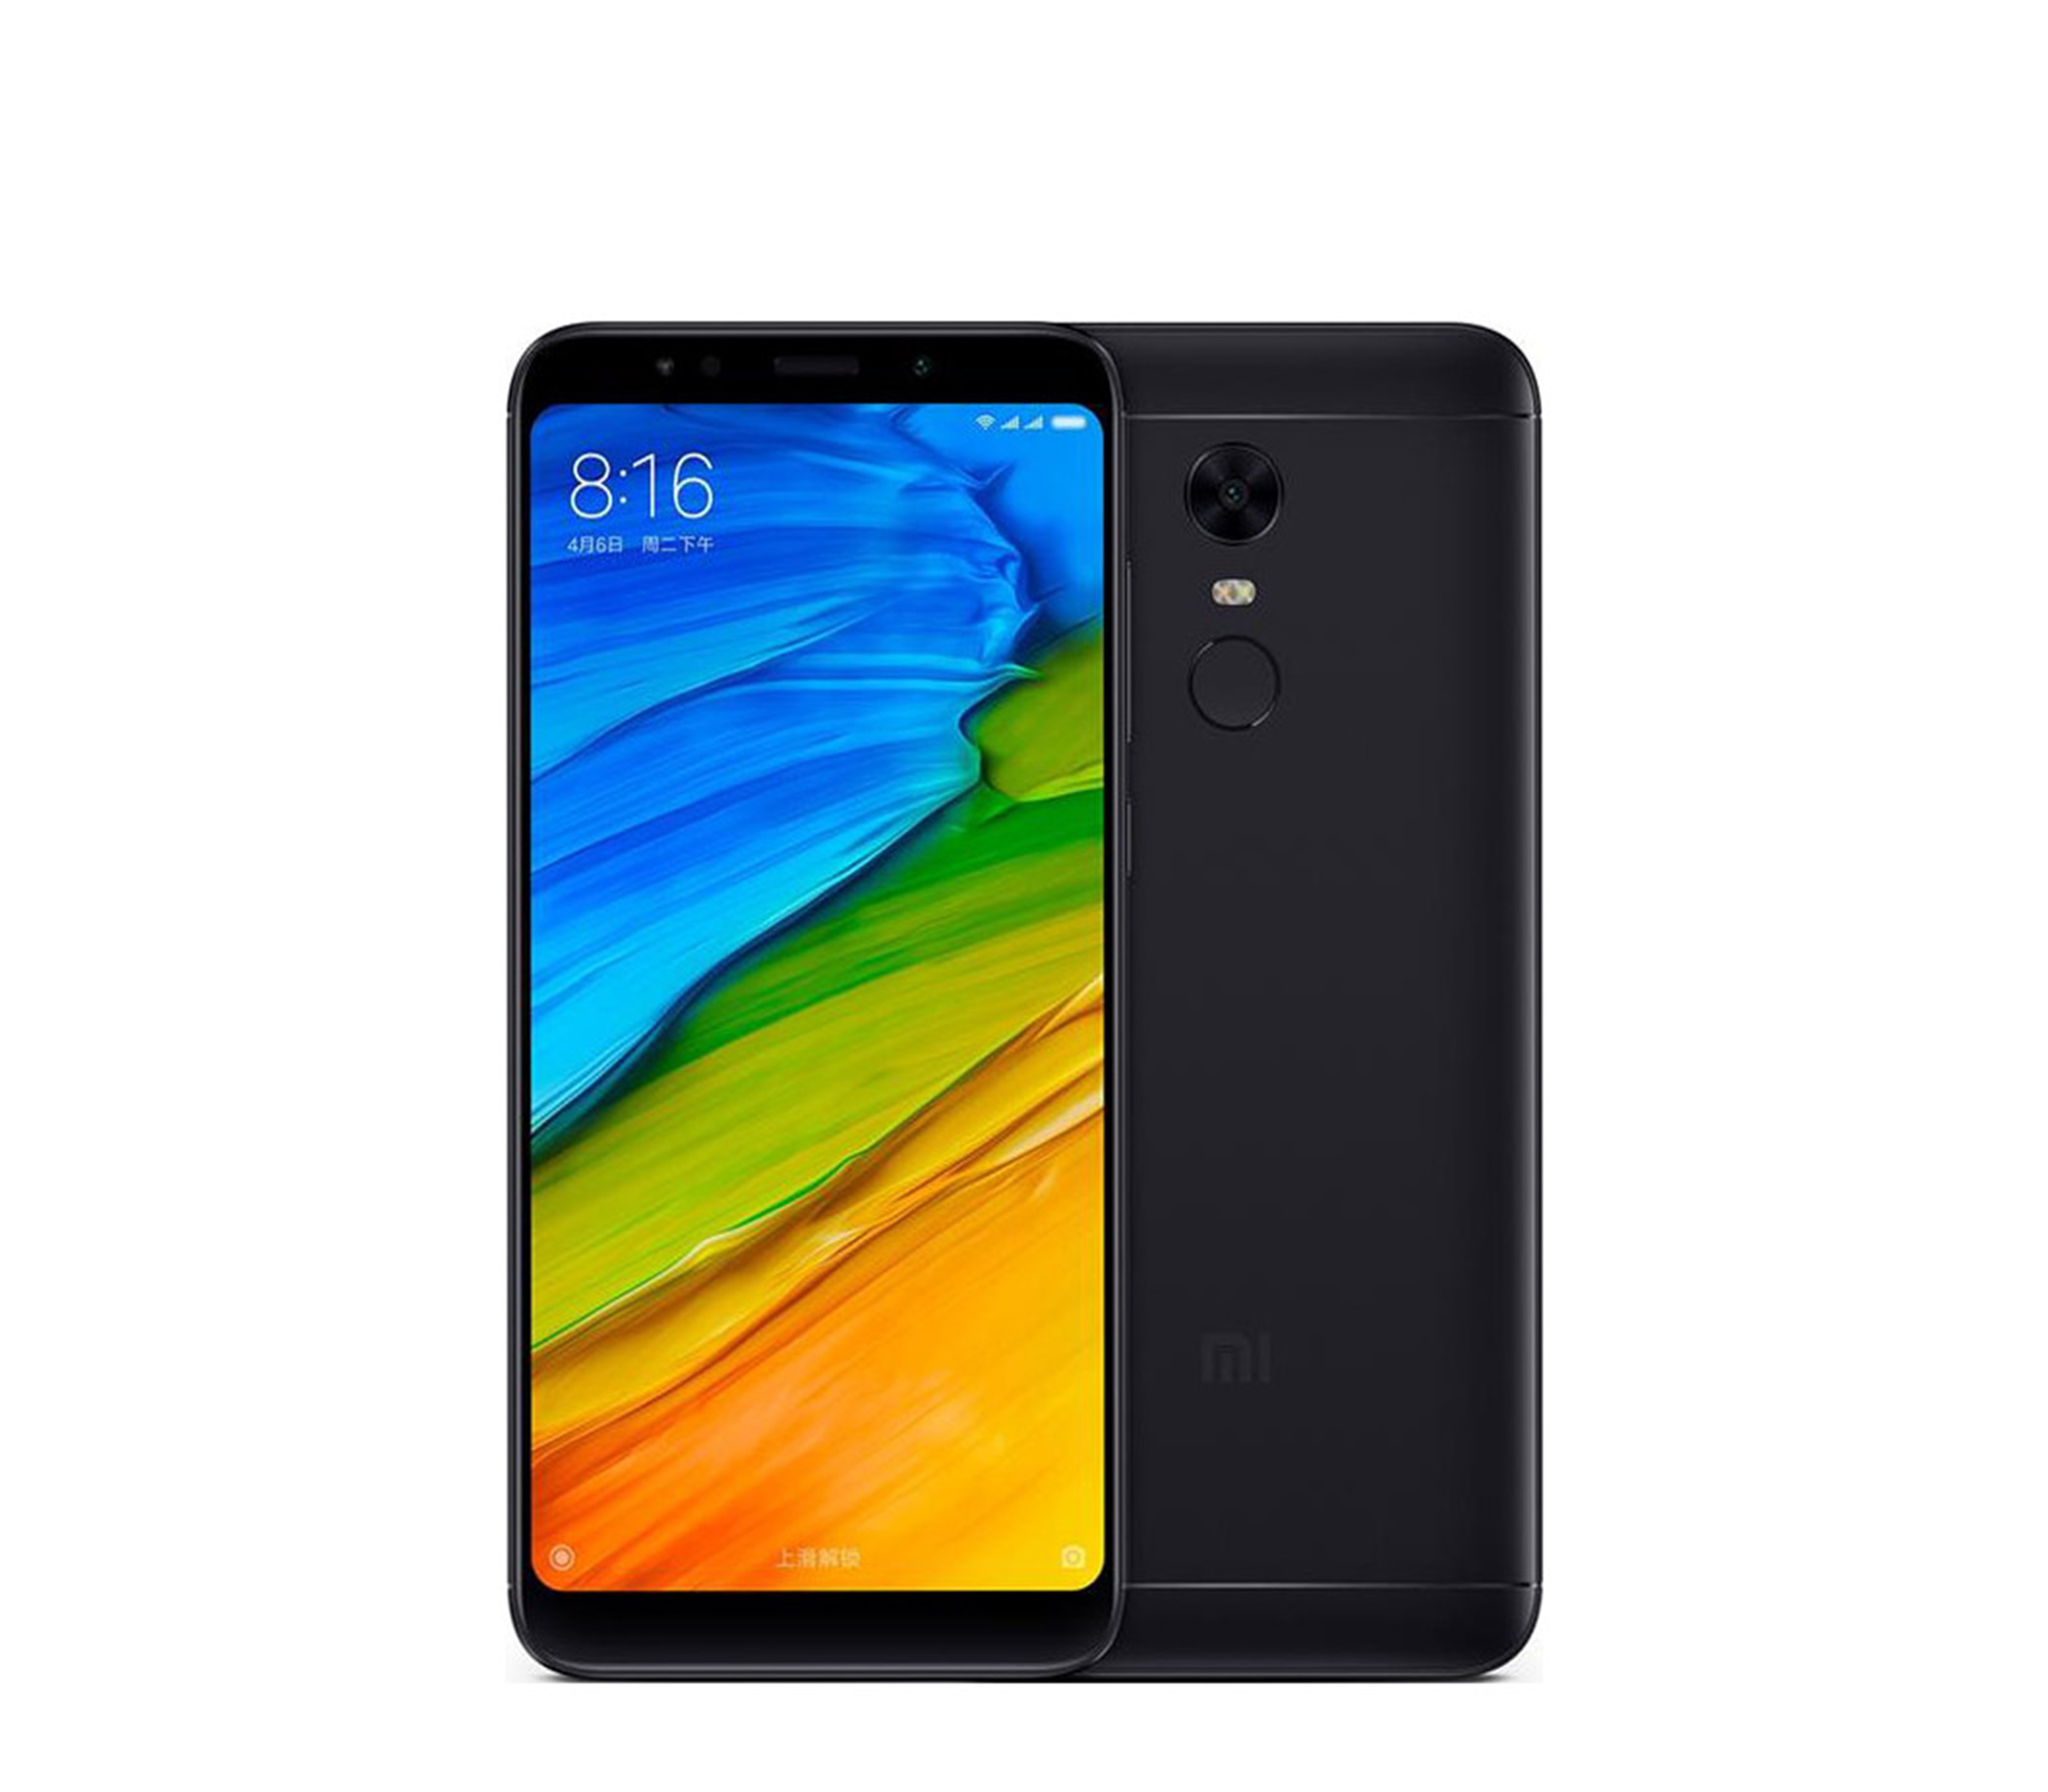 Xiaomi Redmi 5 Plus 4GB/64GB Black